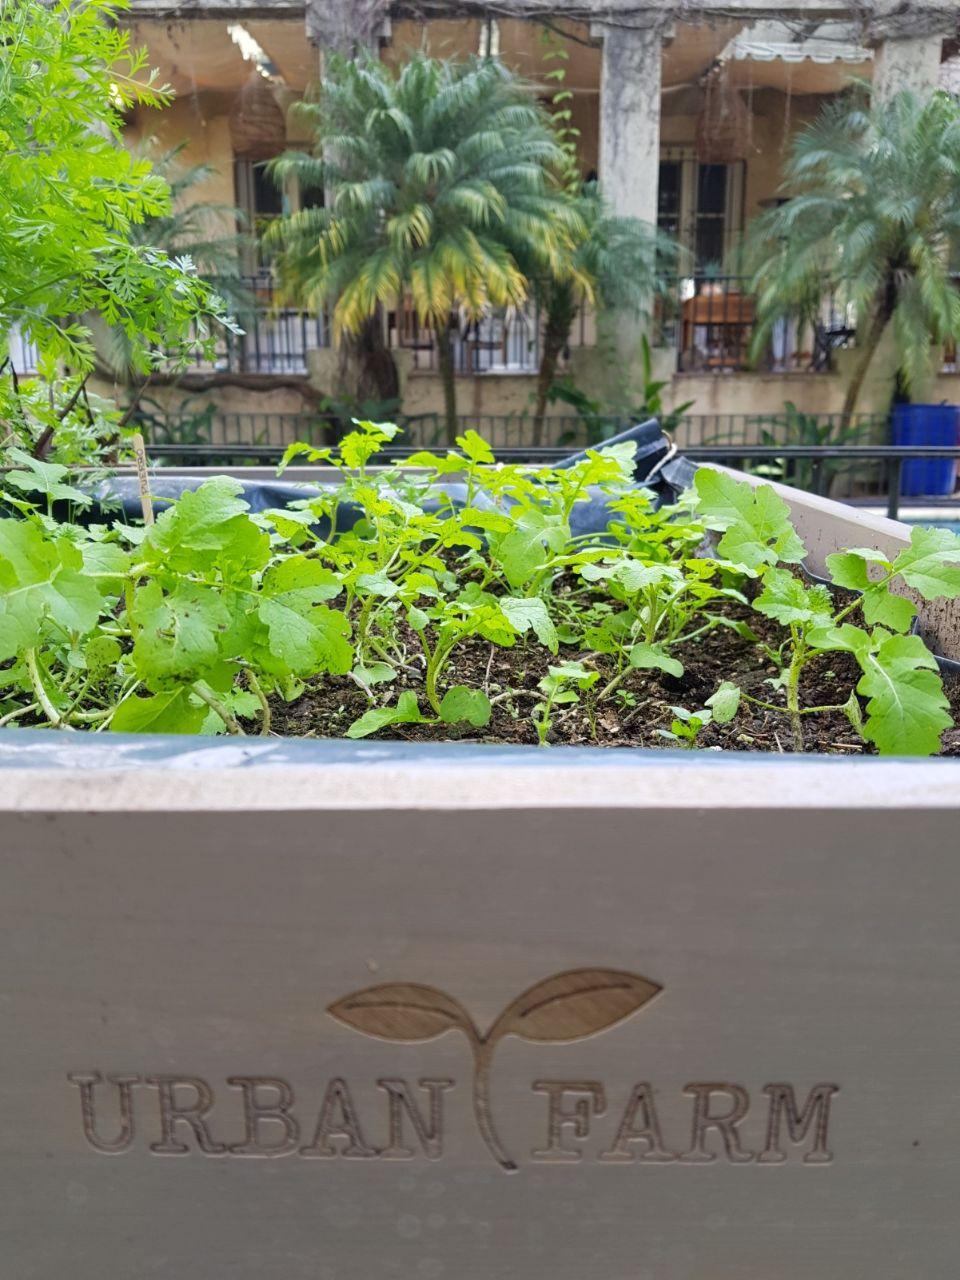 Urban Farm Huertas 8